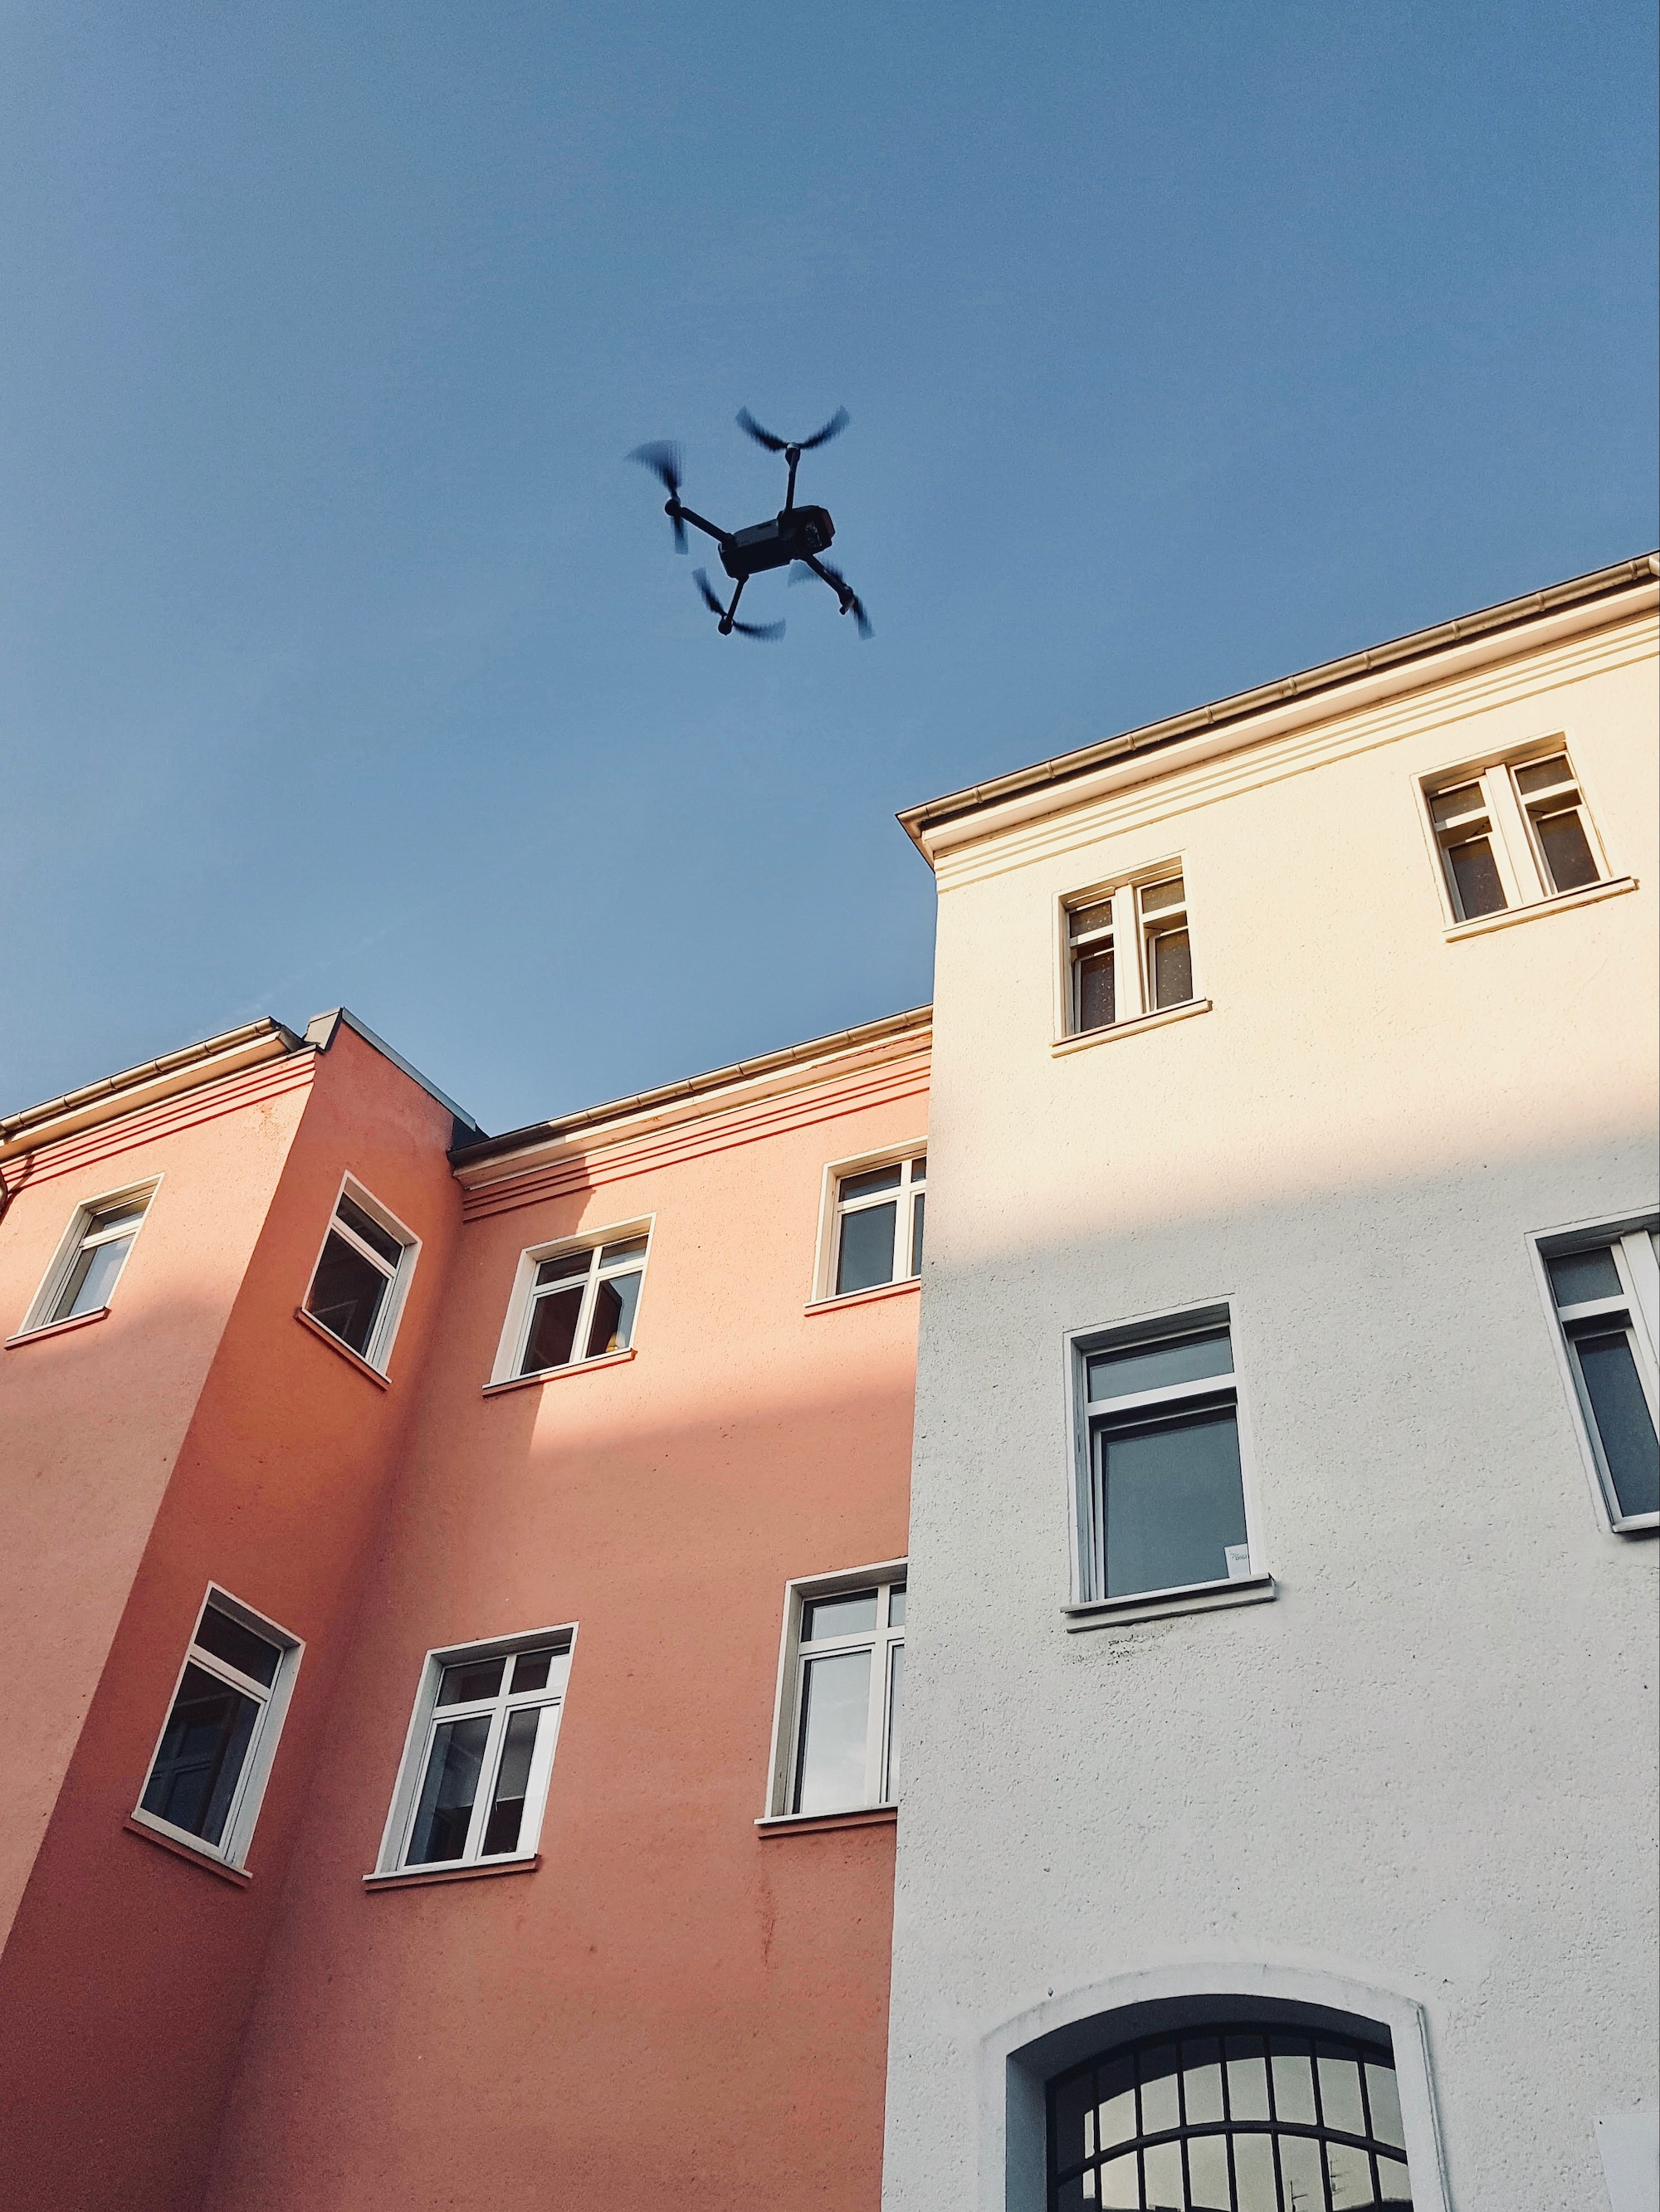 Drohne in Düsseldorf